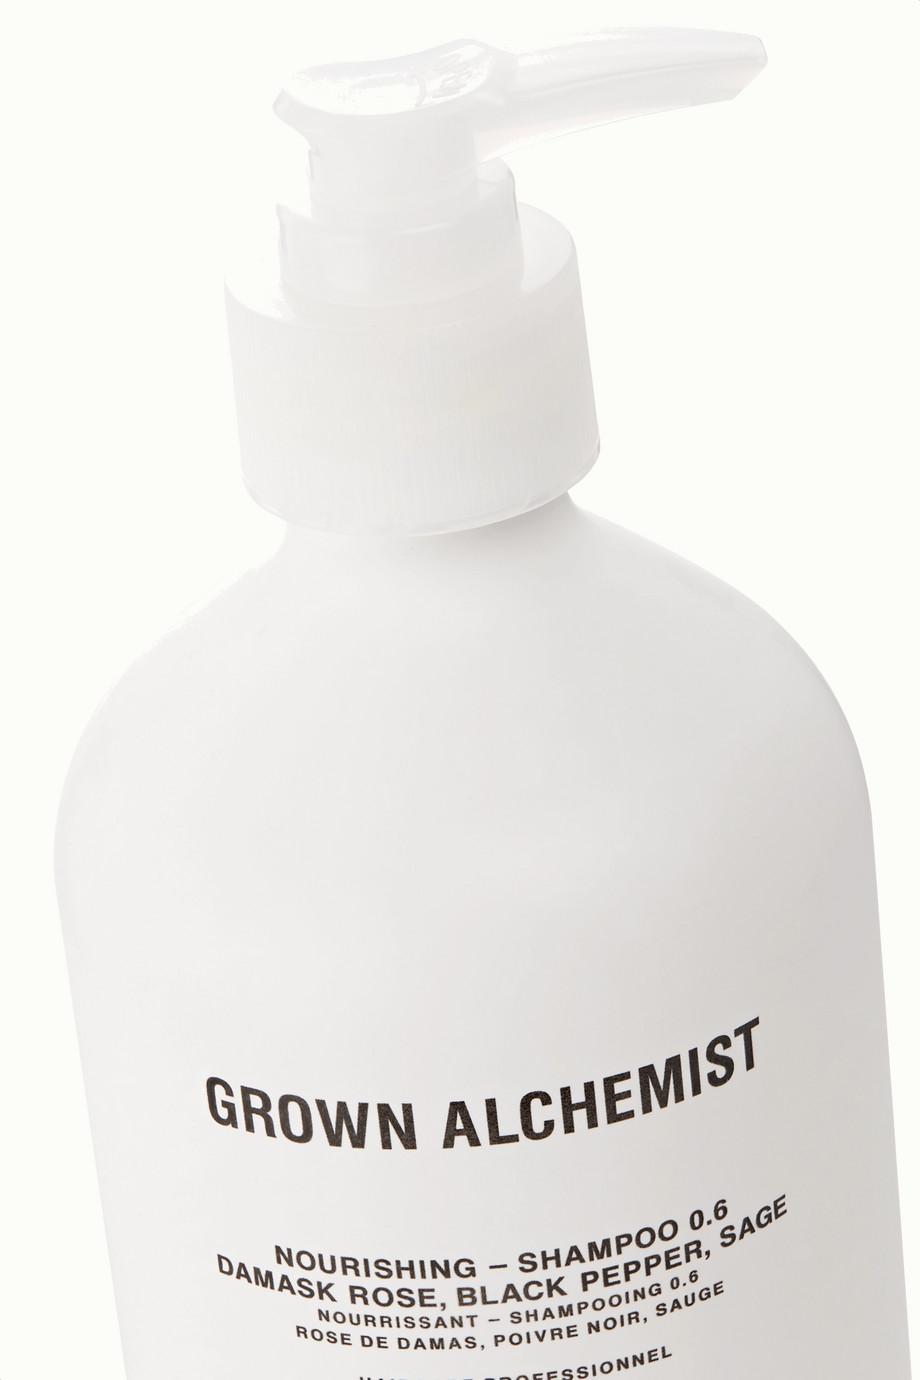 Grown Alchemist Nourishing - Shampoo 0.6, 500ml